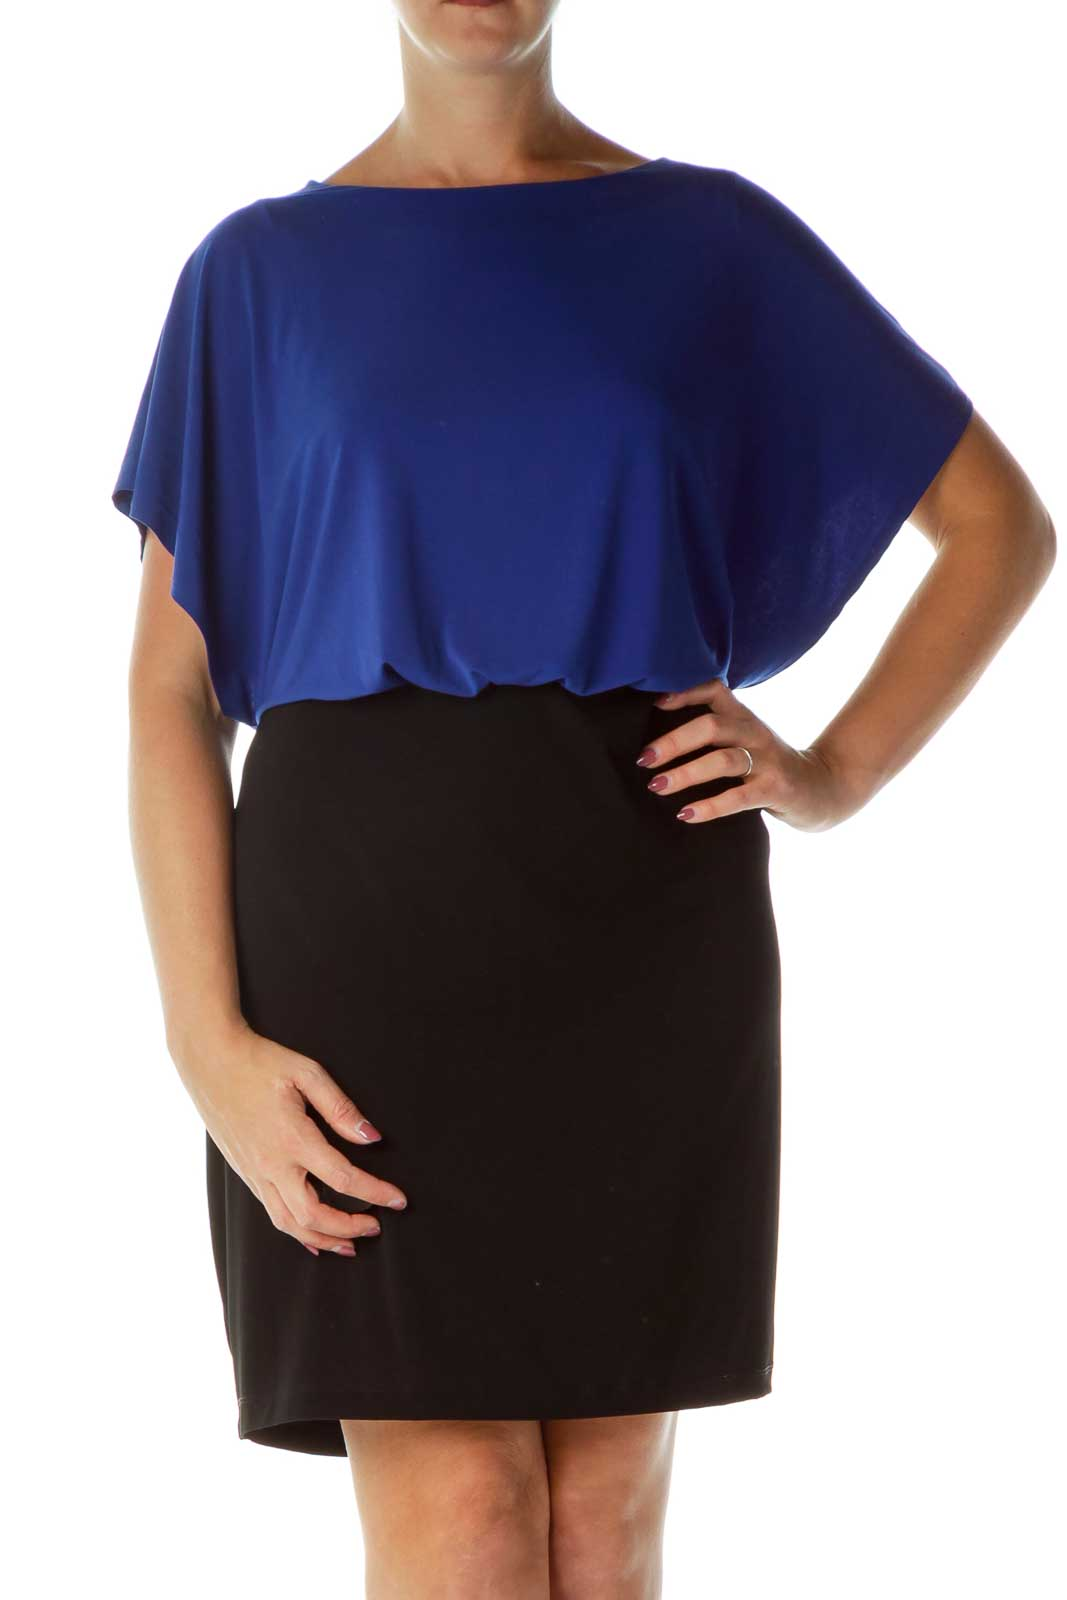 Blue Black Color Block Cocktail Dress Front